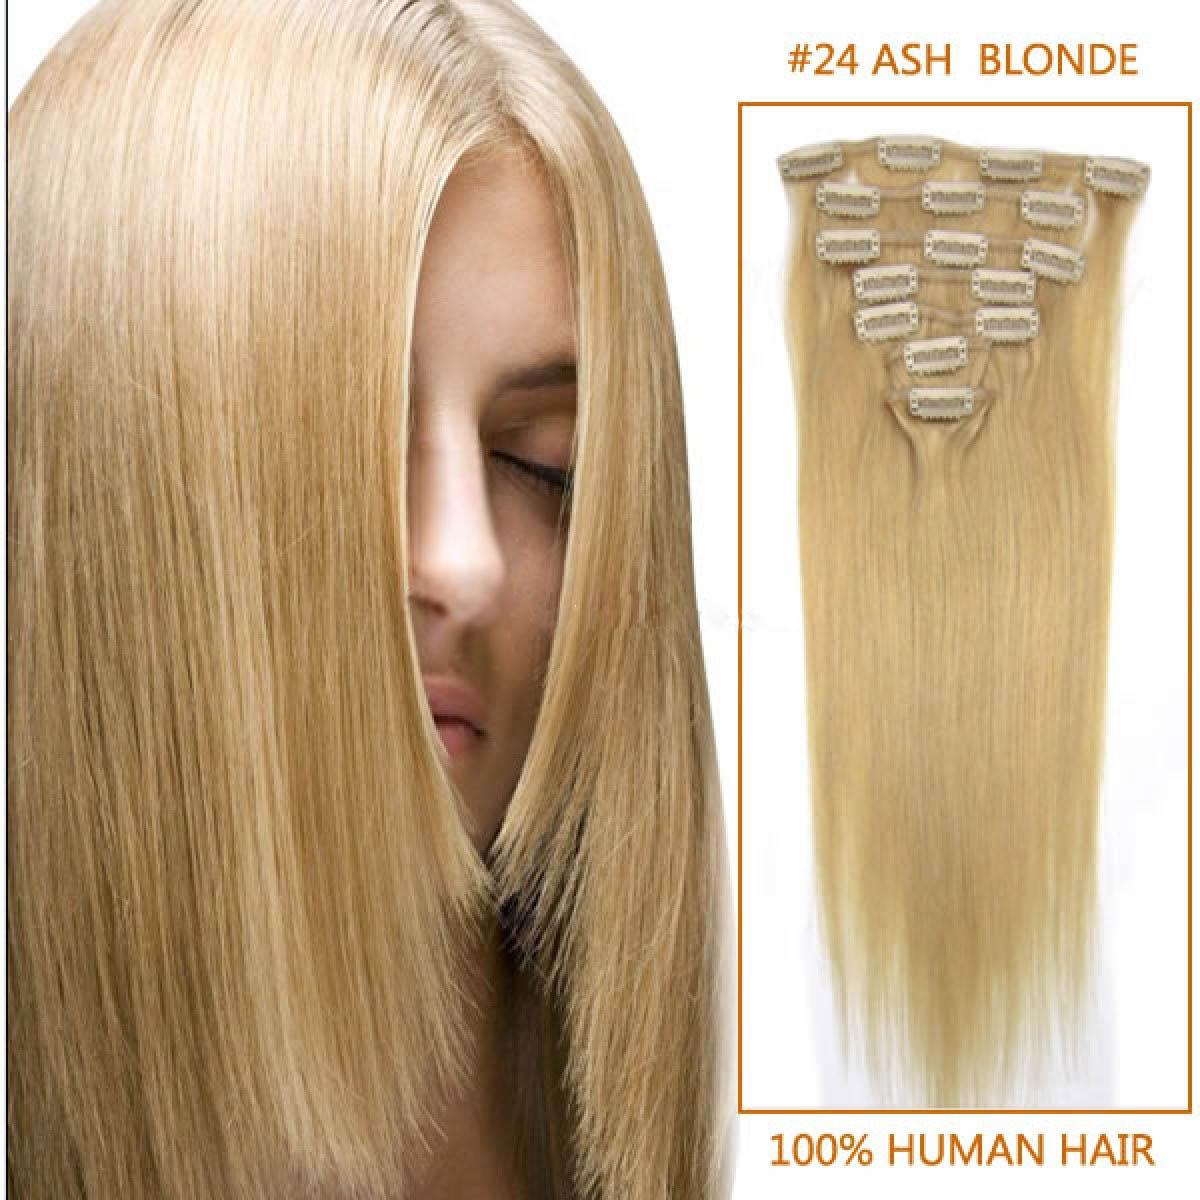 Inch 24 ash blonde clip in remy human hair extensions 12pcs 22 inch 24 ash blonde clip in remy human hair extensions 12pcs pmusecretfo Gallery